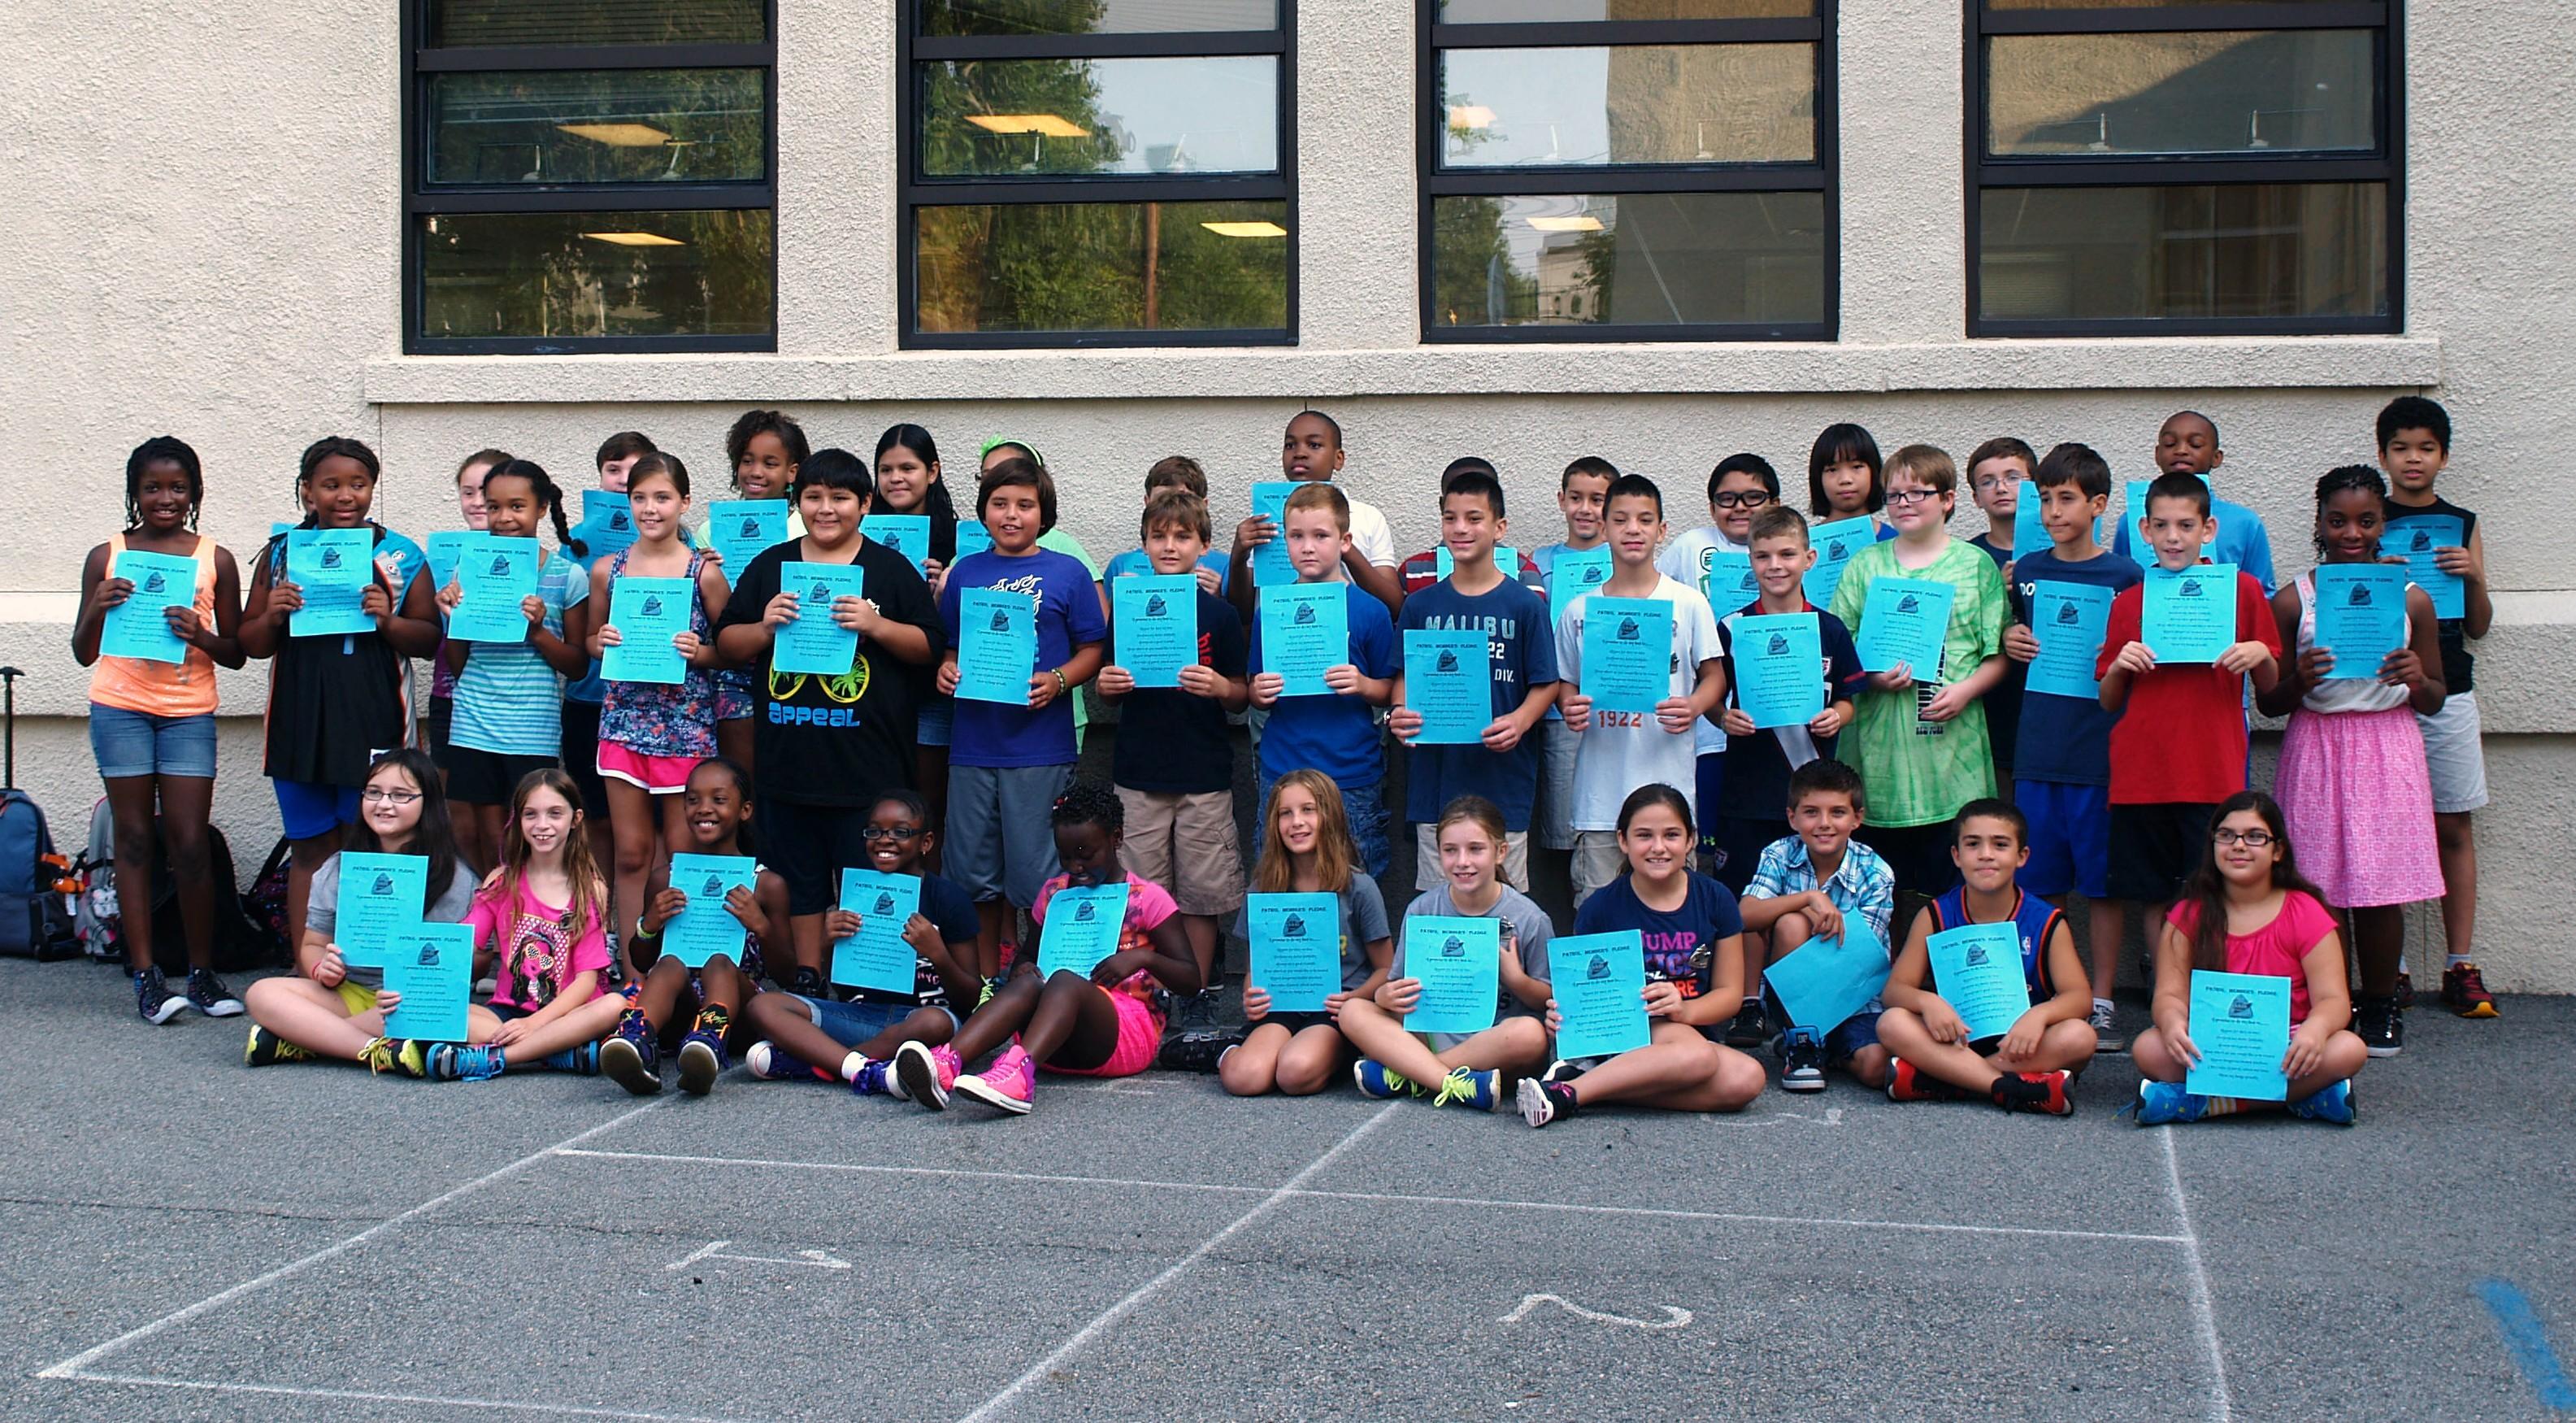 Gregory Elementary School Fifth Grade Safety Patrol